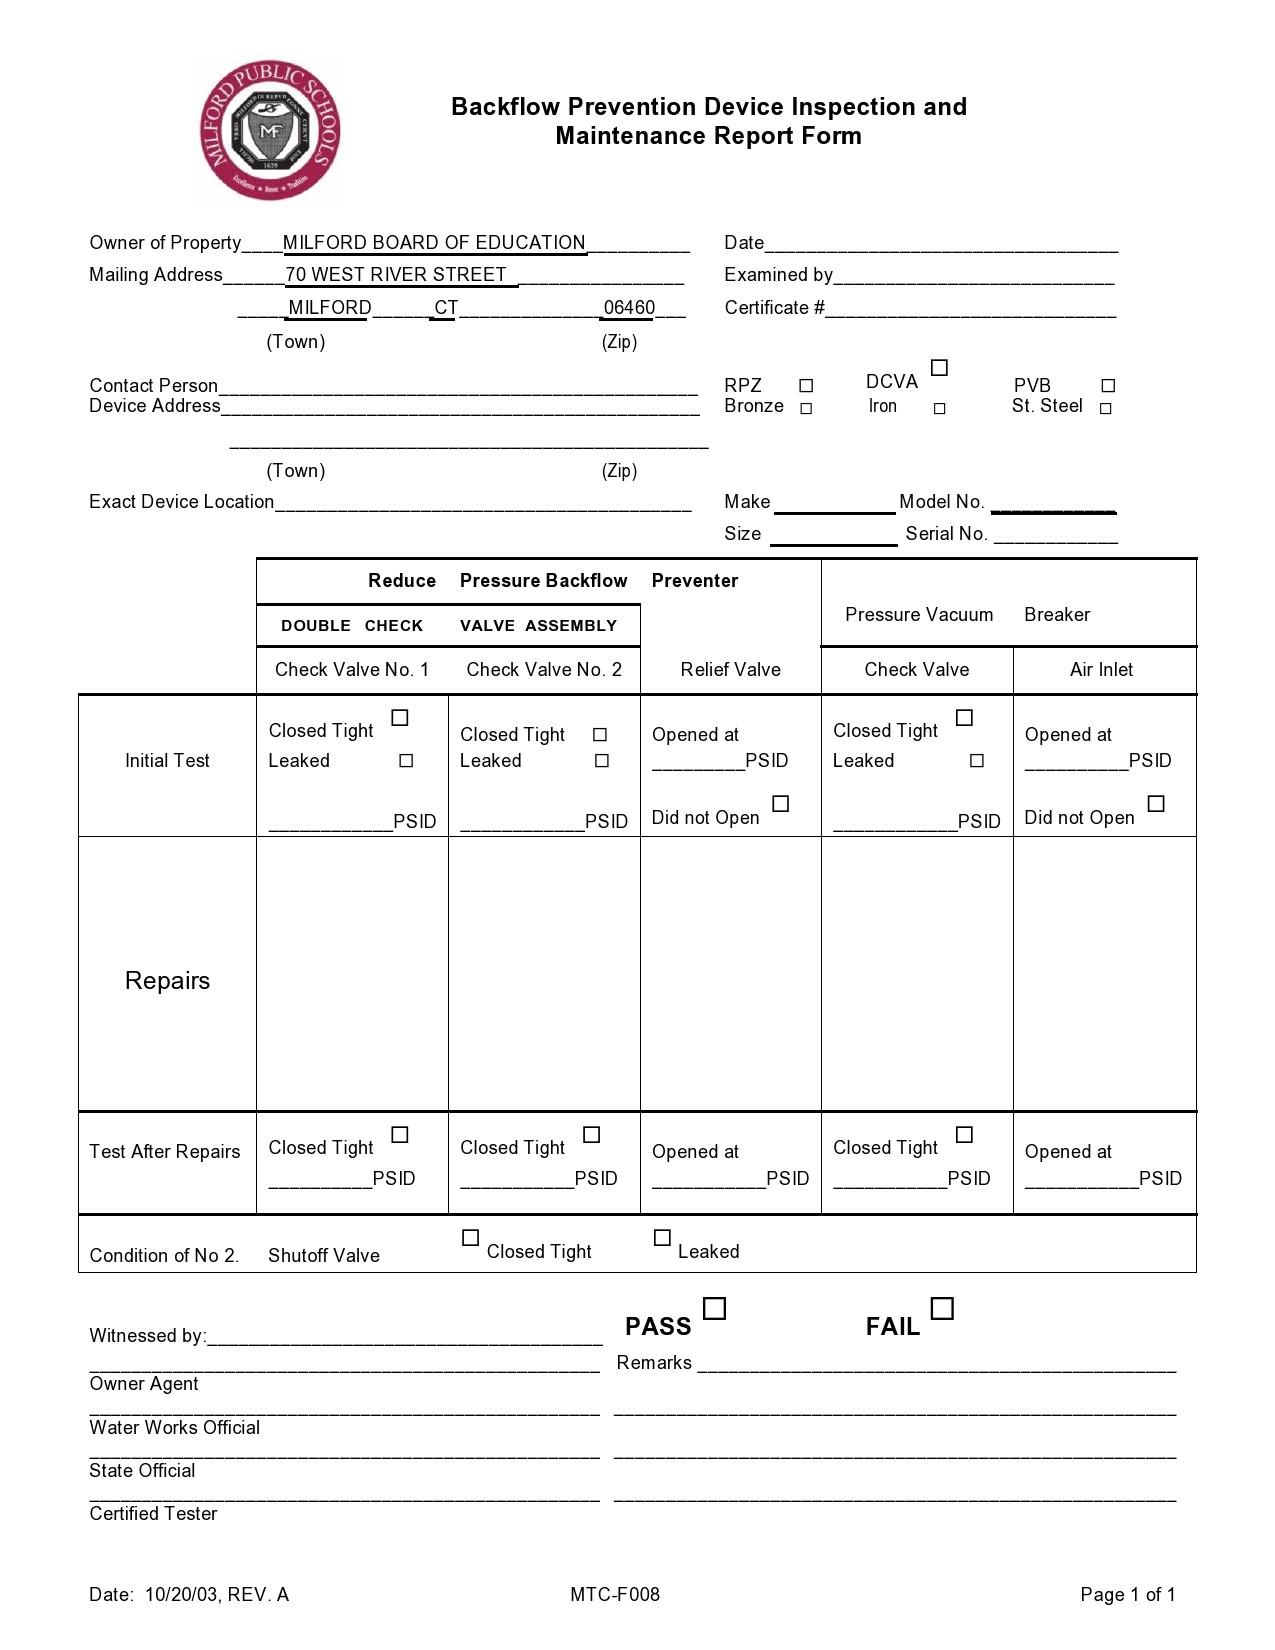 Free maintenance report form 17